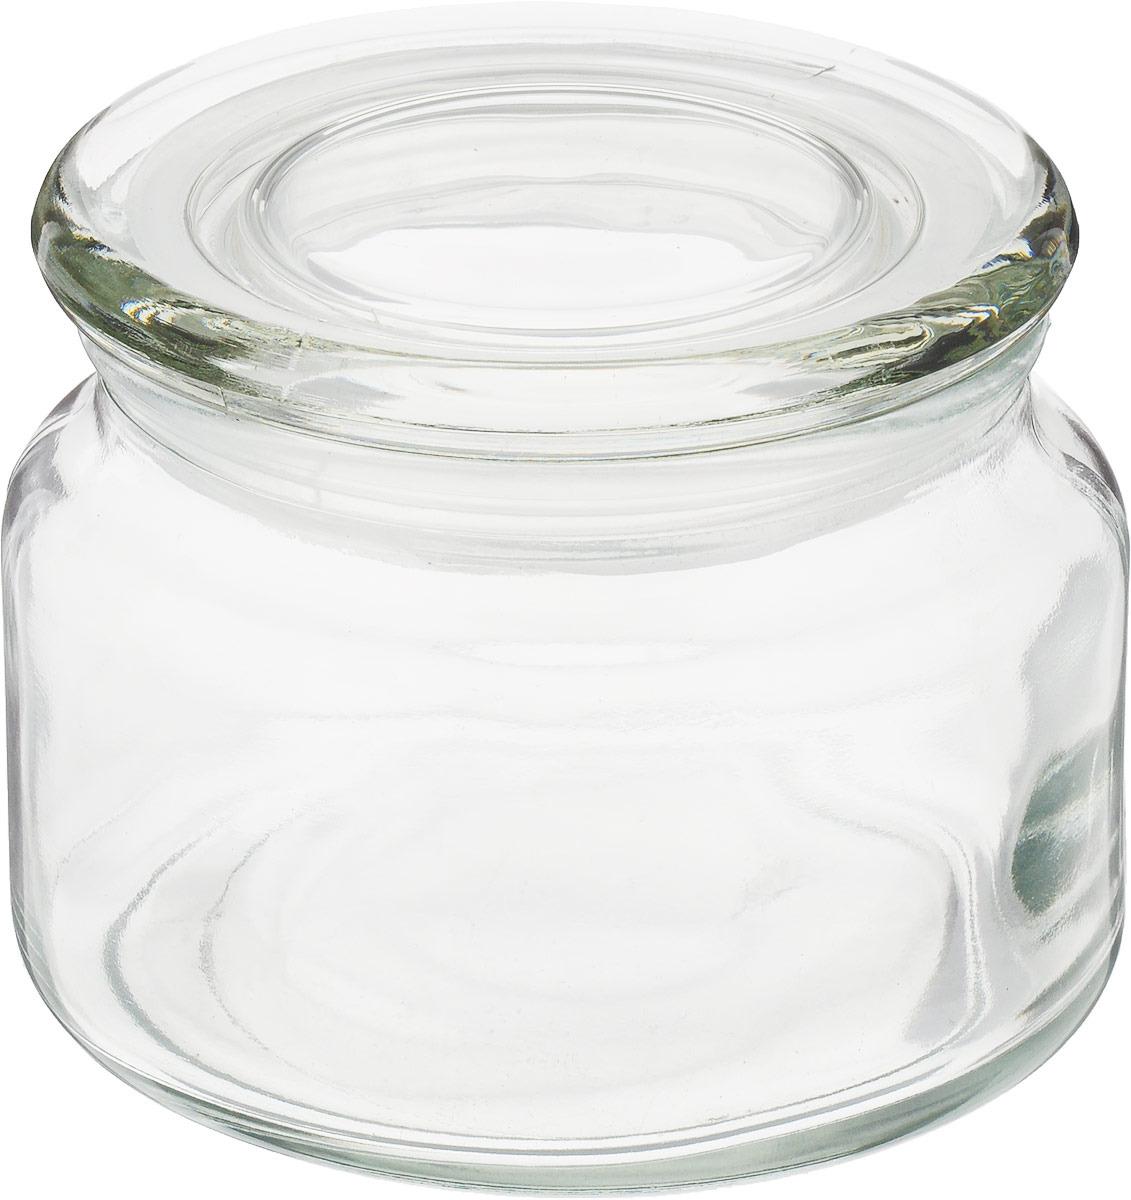 Банка для сыпучих продуктов Loraine, 28084, прозрачный, 270 мл банка для сыпучих продуктов loraine 28190 прозрачный 600 мл